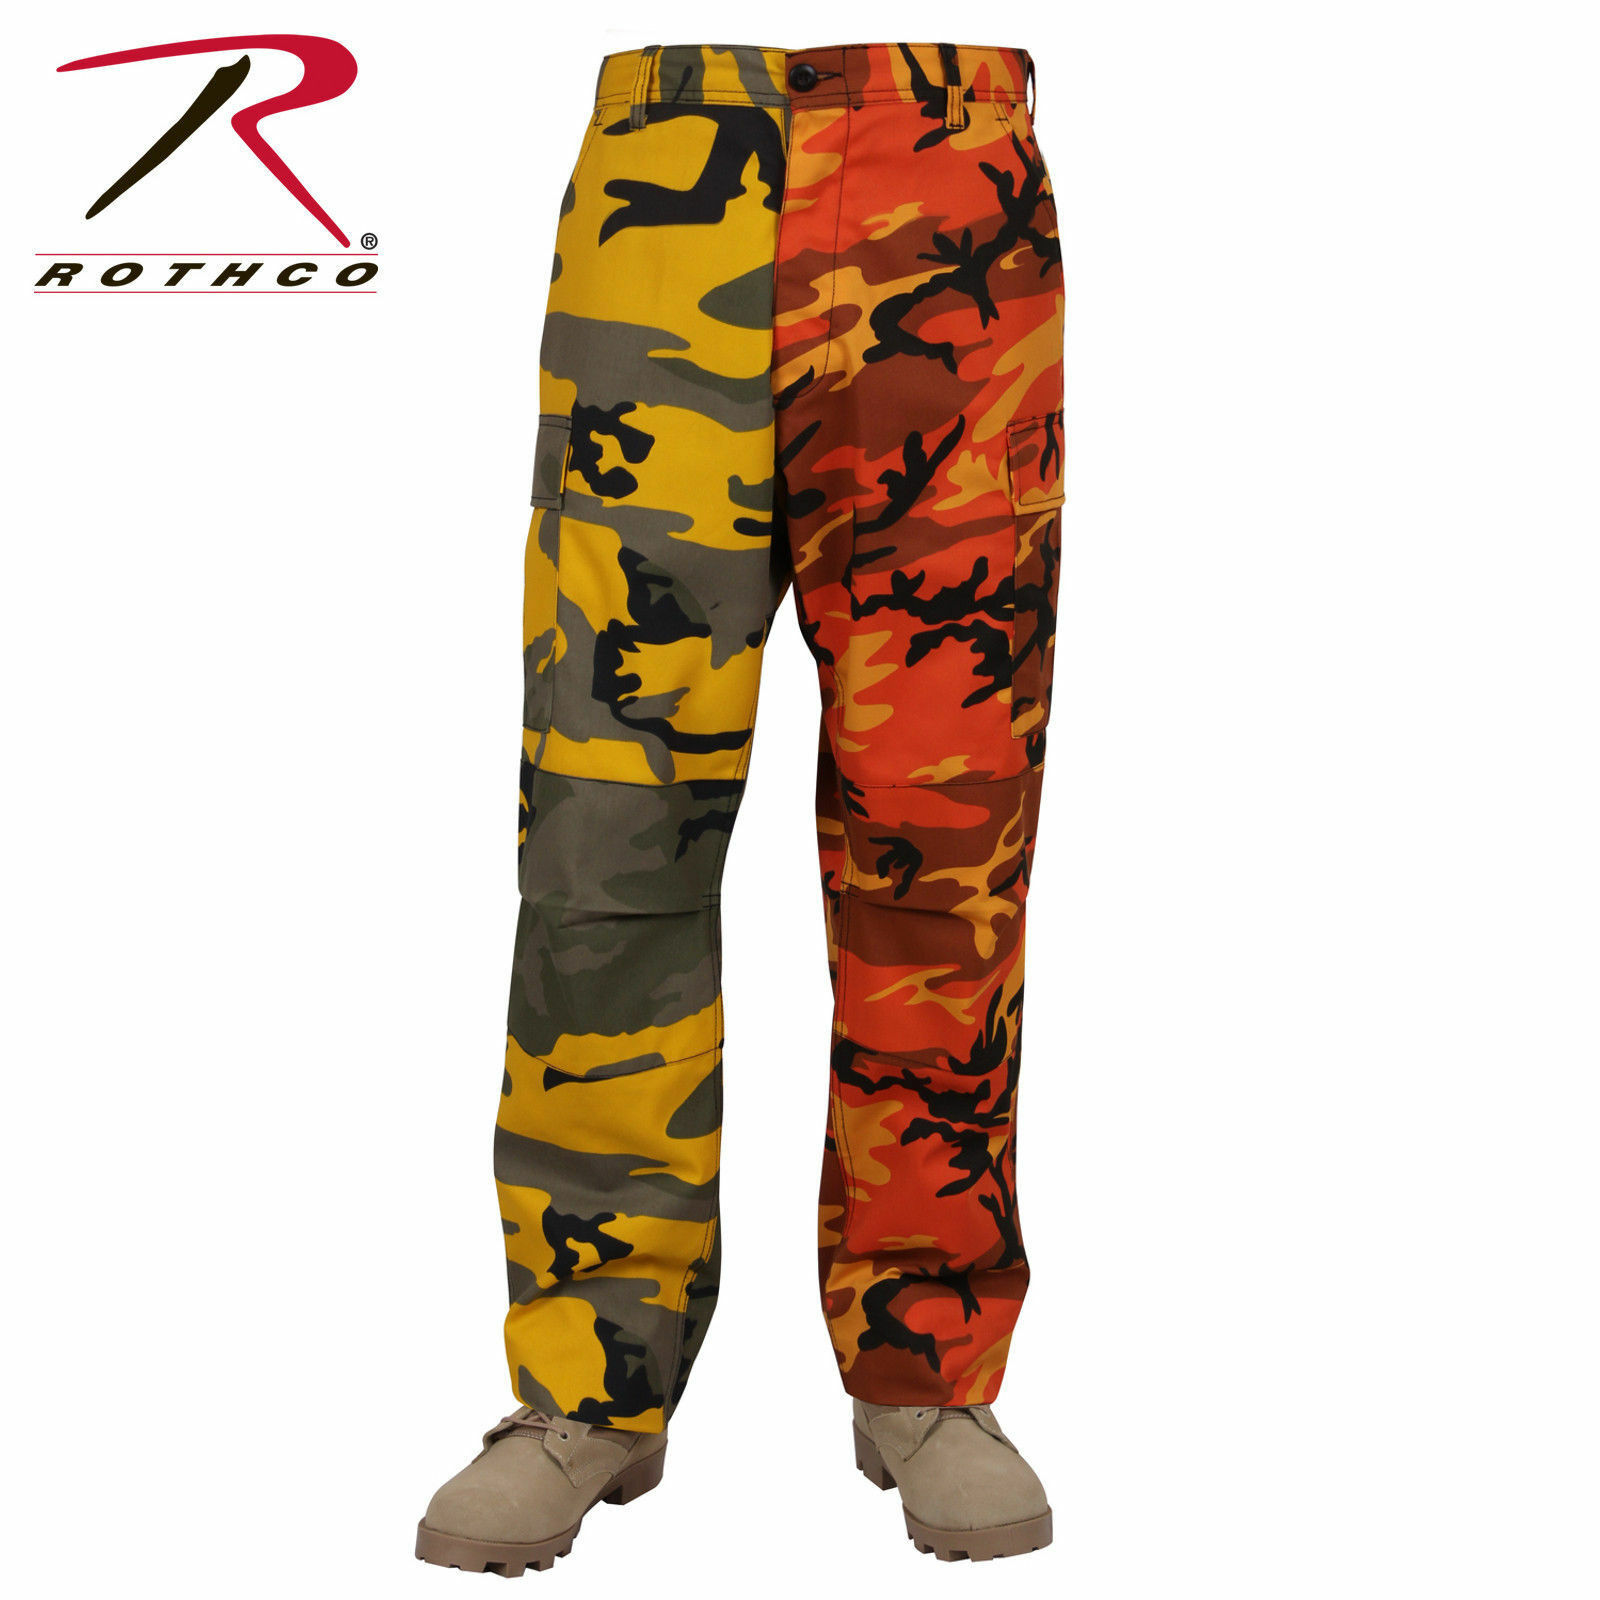 redHCO 1830 MENS BDU PANTS CARGO TWO TONE orange CAMOFLAGE YELLOW CAMO XS TO 3X